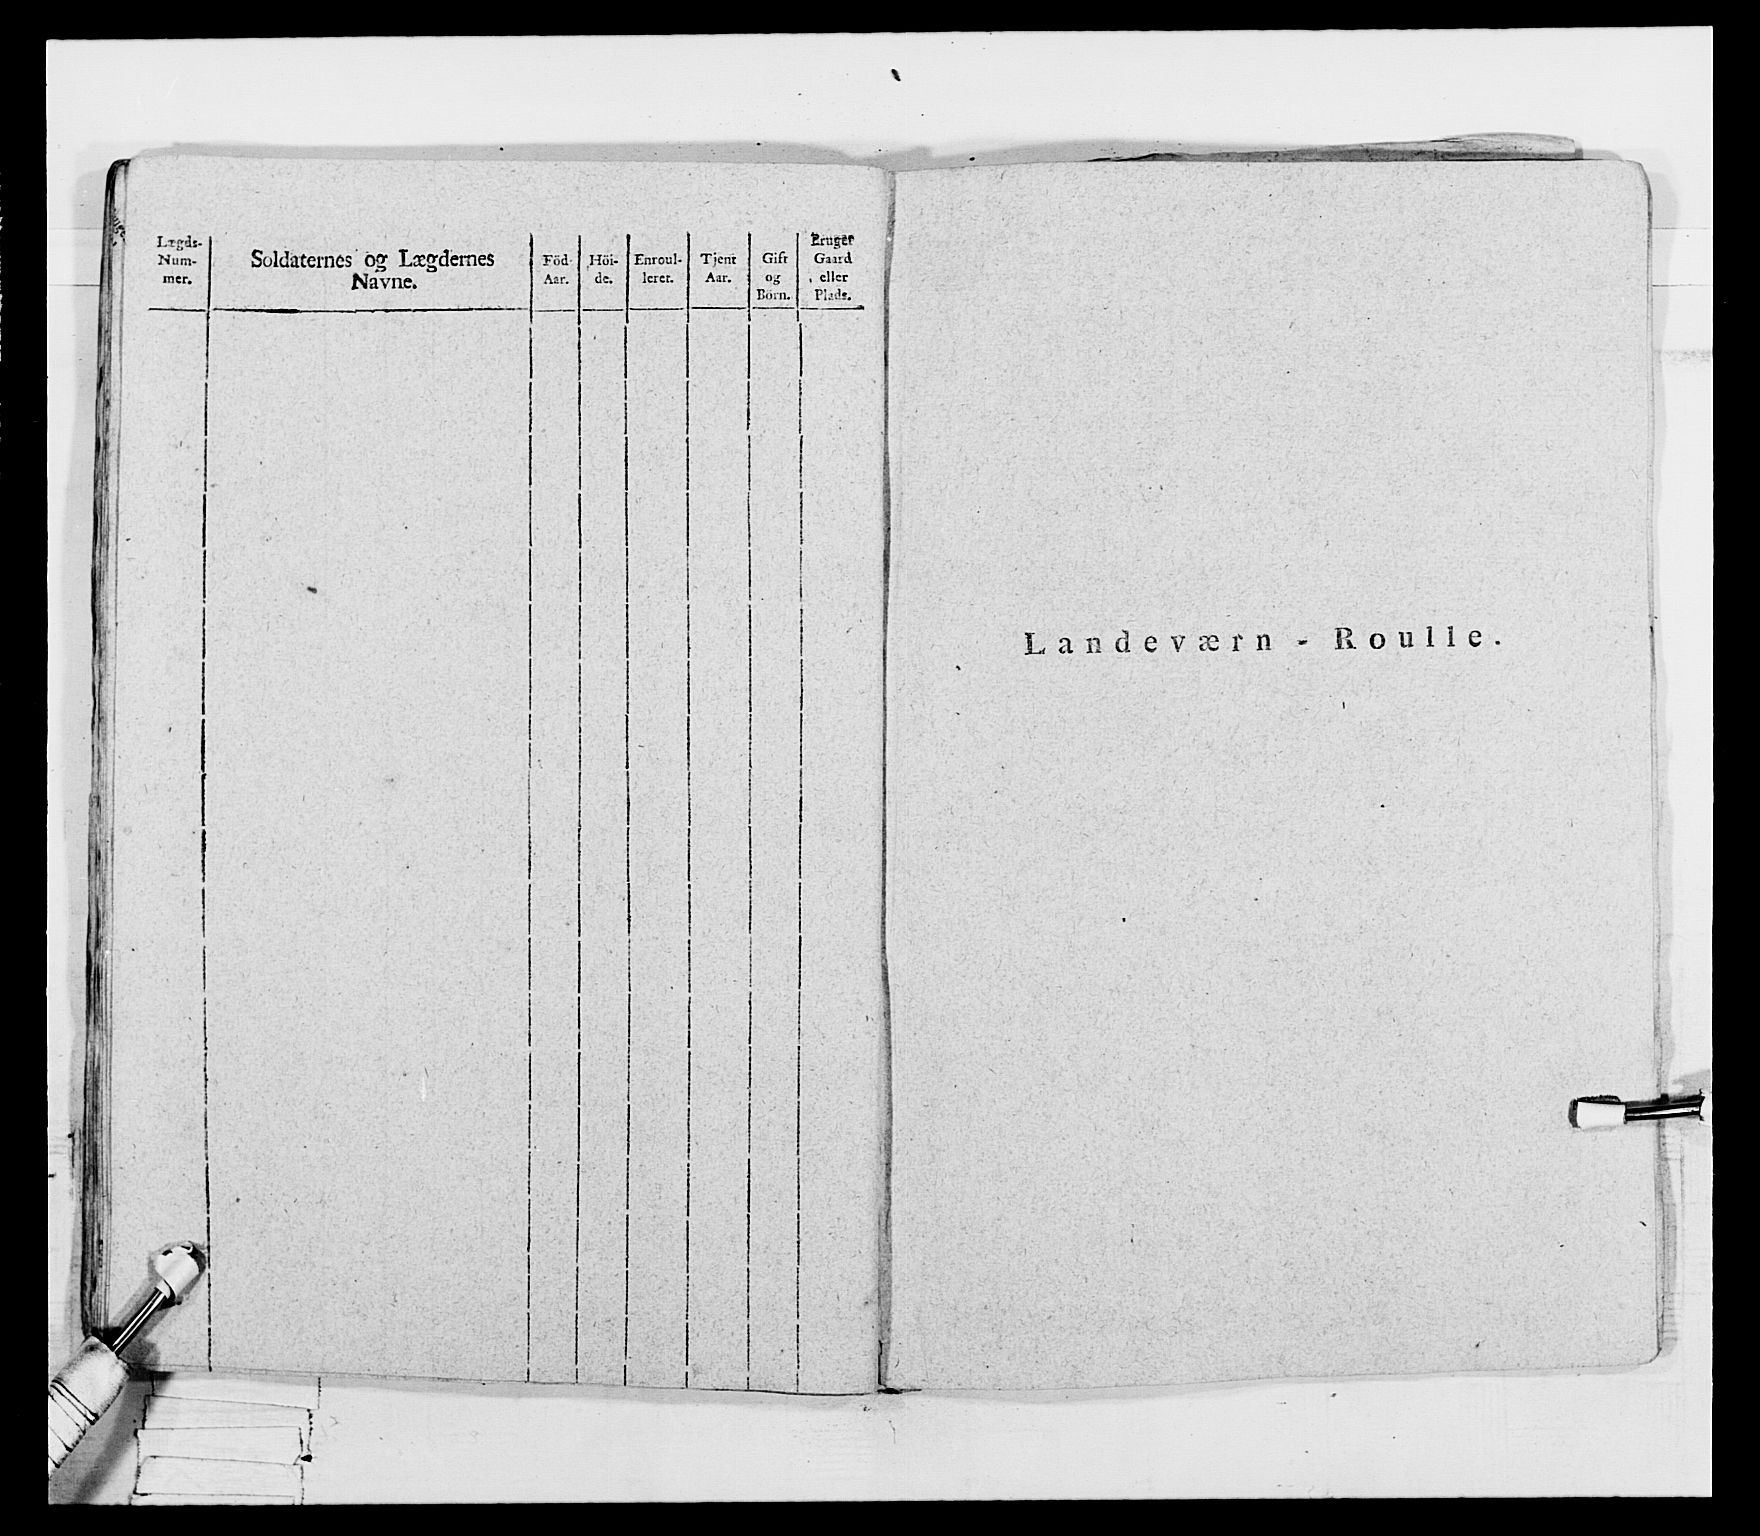 RA, Generalitets- og kommissariatskollegiet, Det kongelige norske kommissariatskollegium, E/Eh/L0069: Opplandske gevorbne infanteriregiment, 1810-1818, s. 191